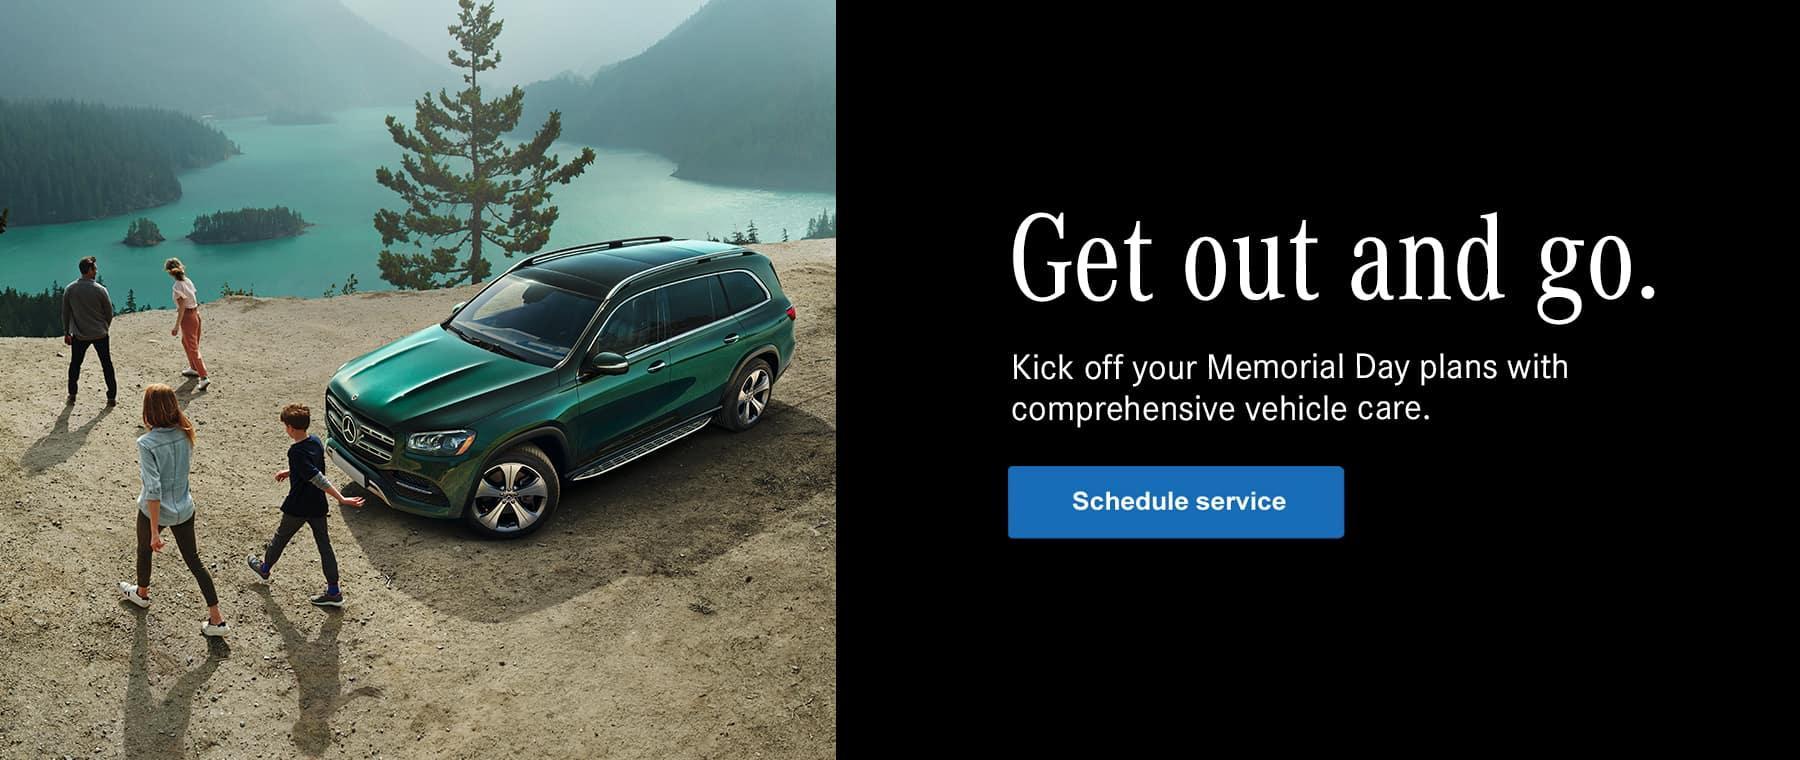 Mercedes-Benz memorial day